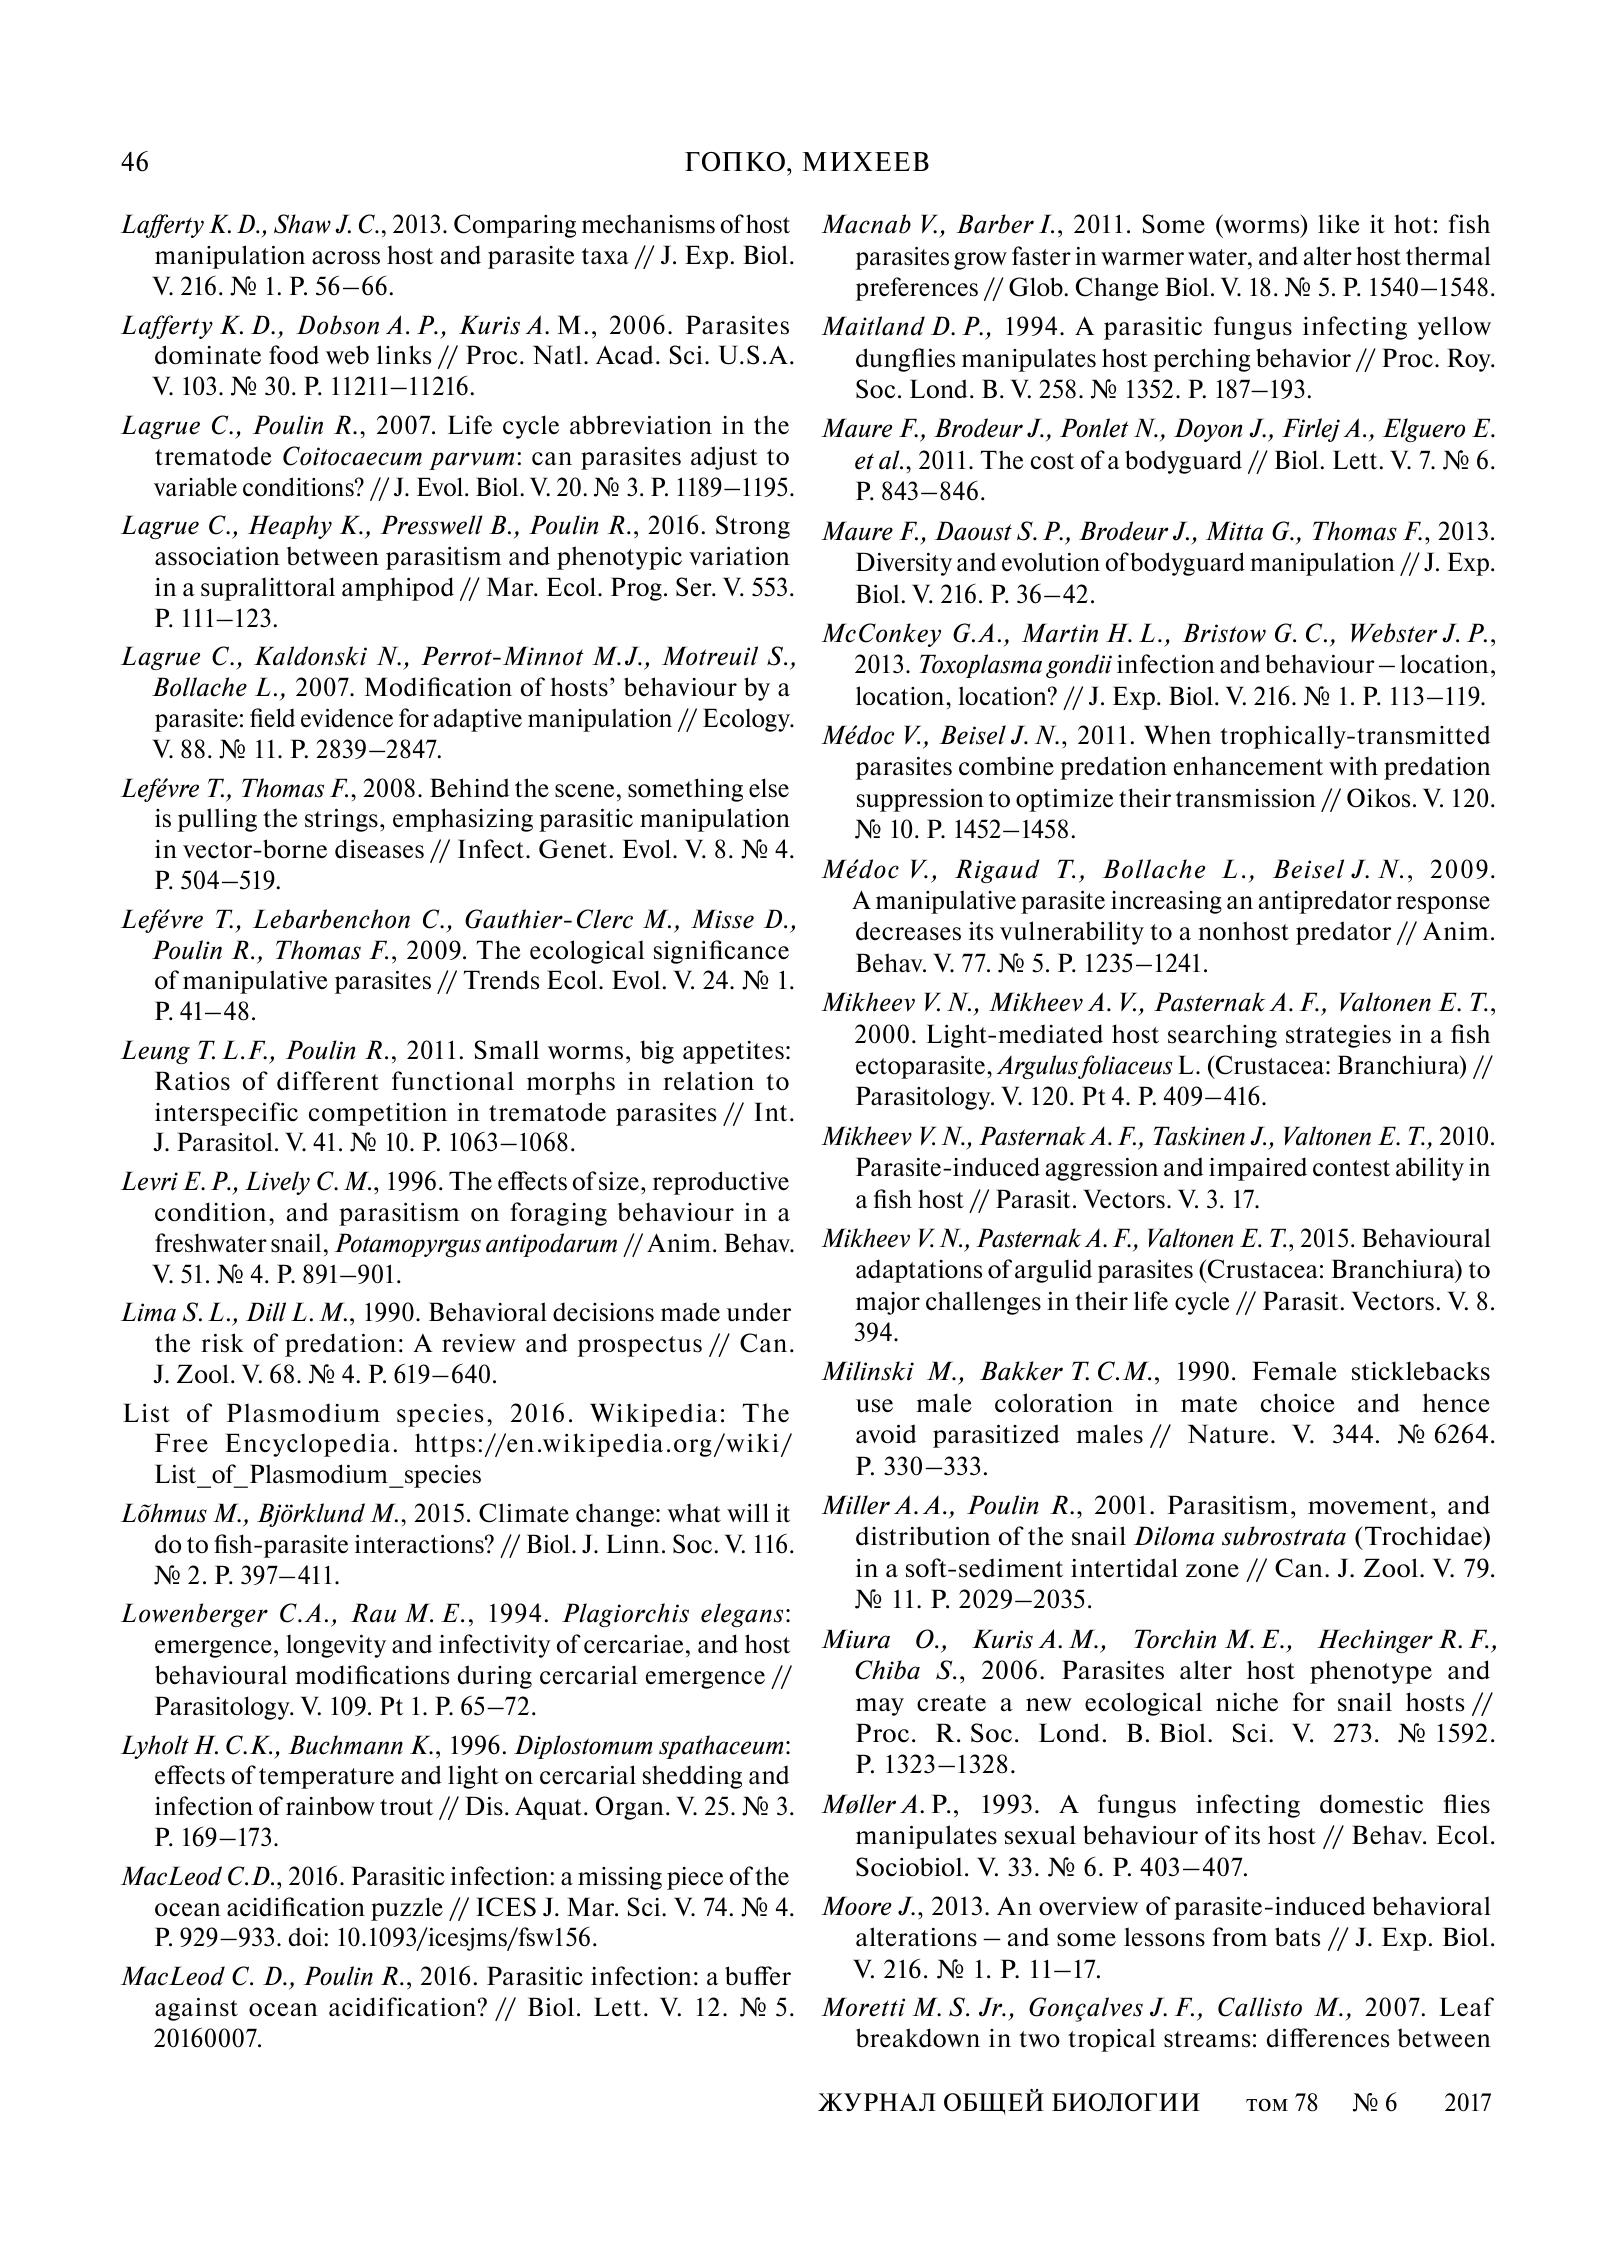 pdf_page_image-00031